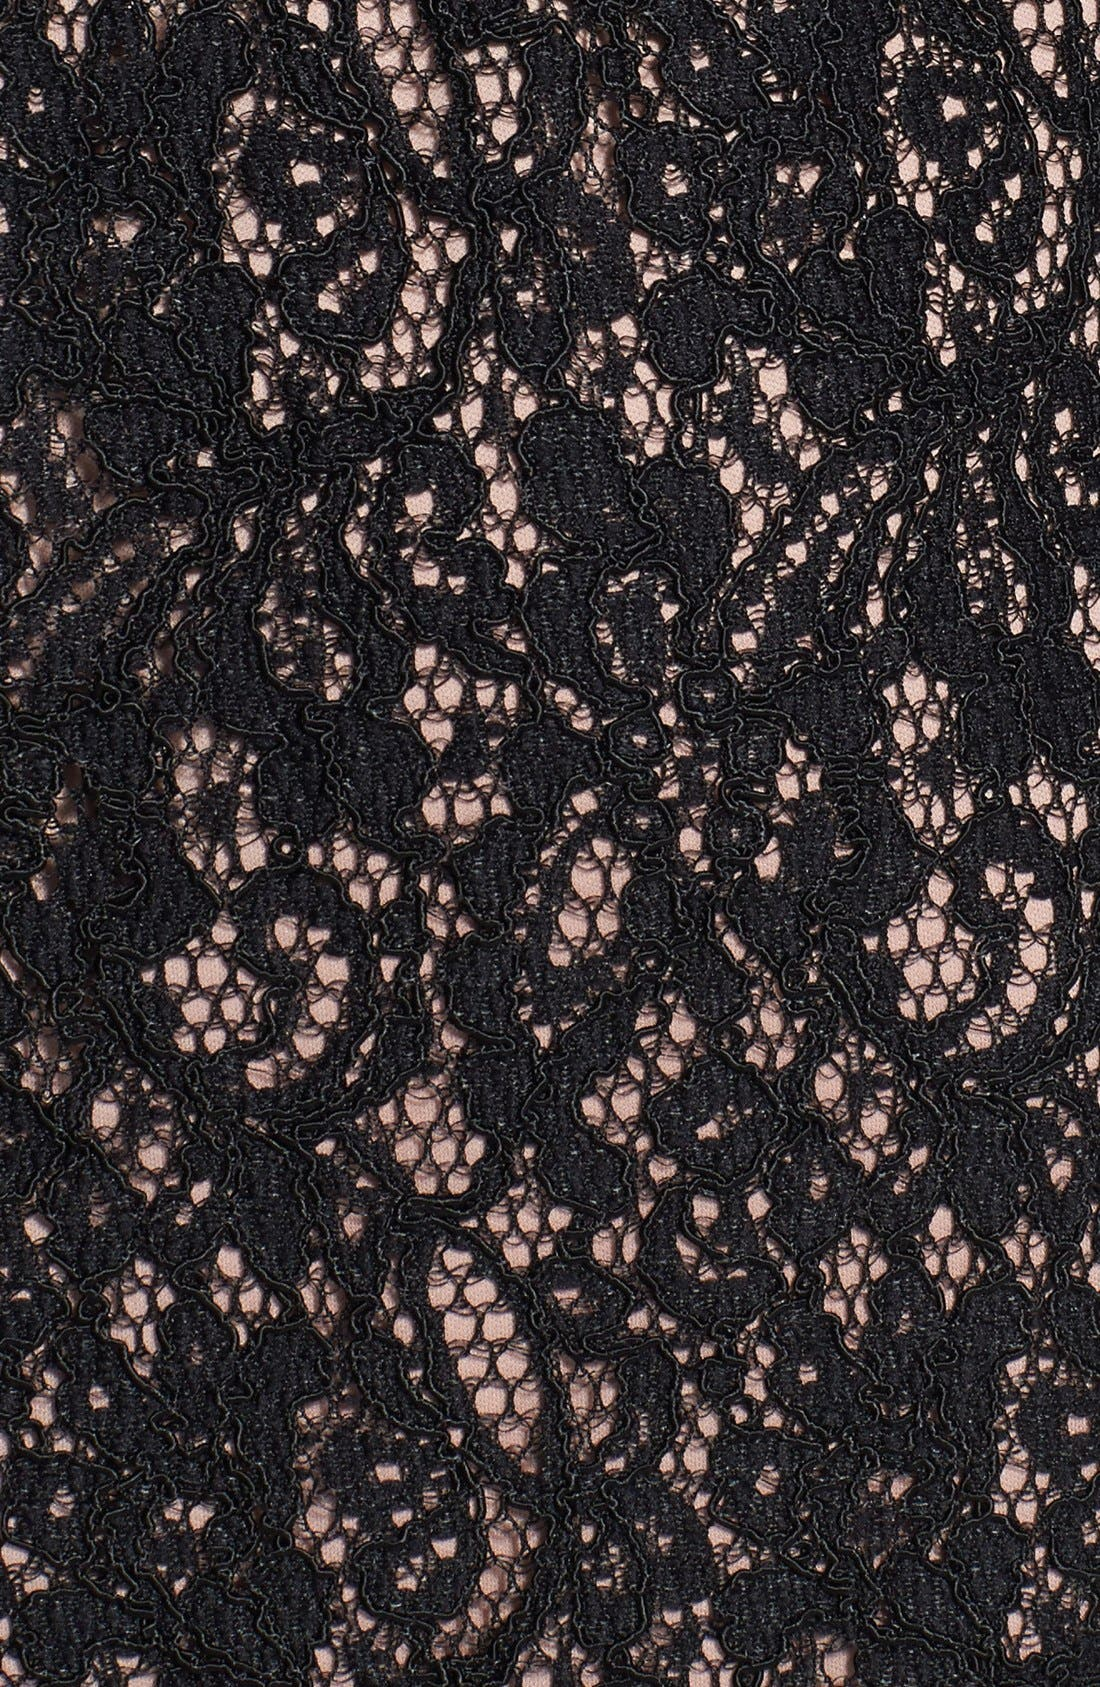 Boatneck Lace Sheath Dress,                             Alternate thumbnail 39, color,